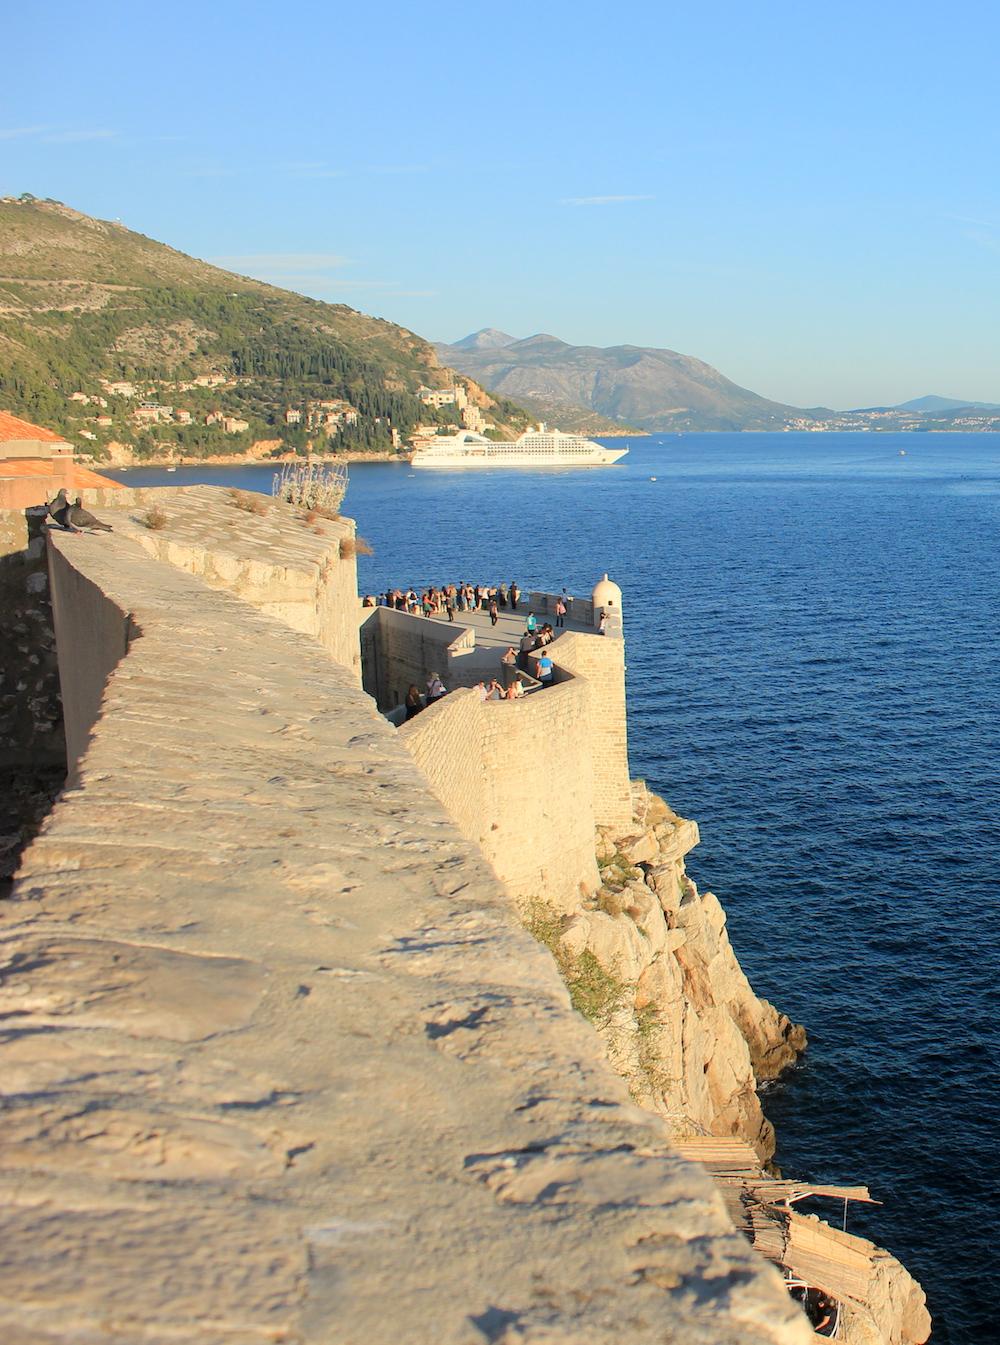 City walls of Dubrovnik, Croatia | Photo credit: Rose Spaziani